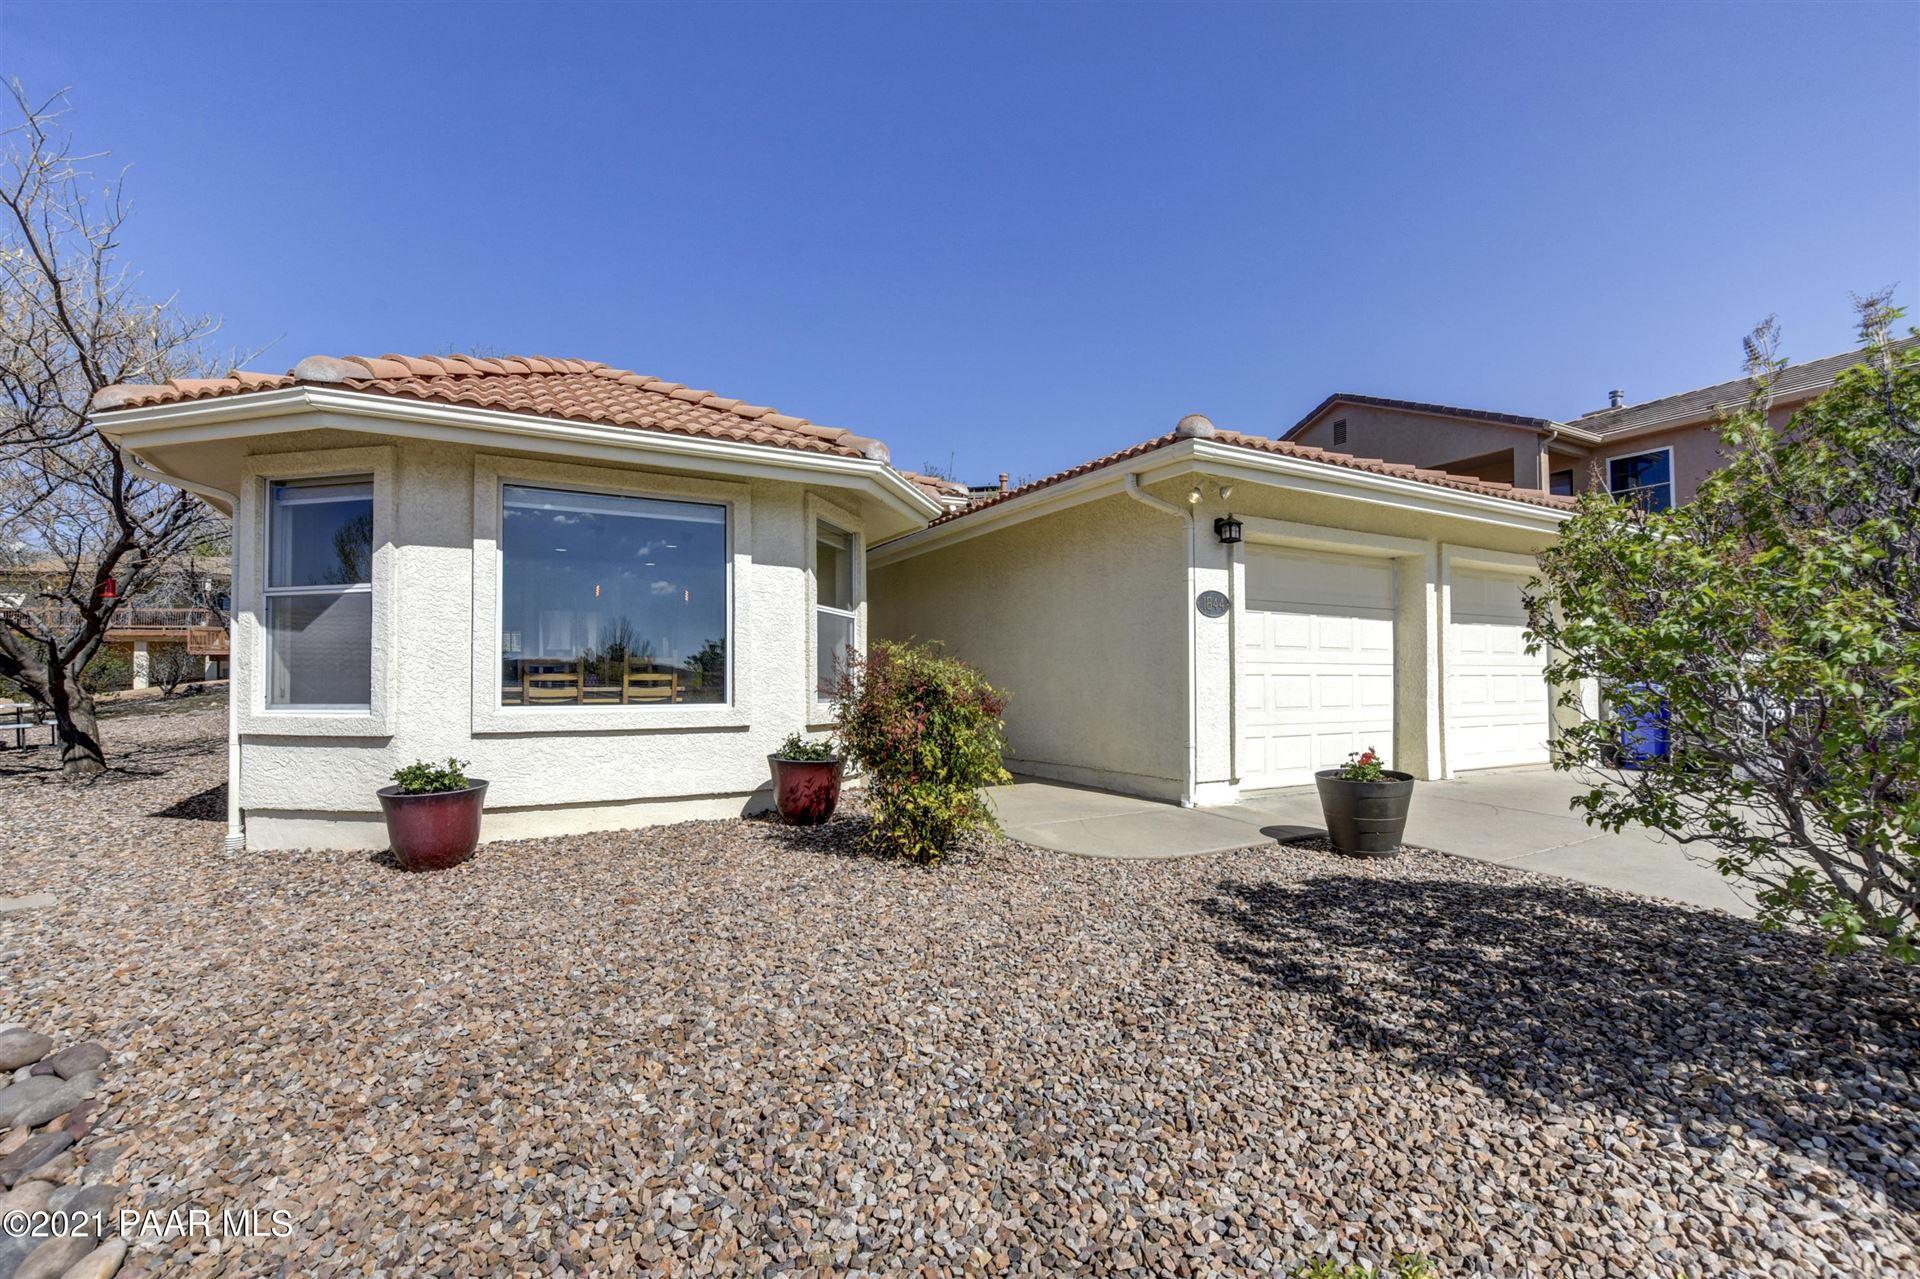 Photo of 1844 Oriental Avenue #Lot: 71, Prescott, AZ 86301 (MLS # 1037638)